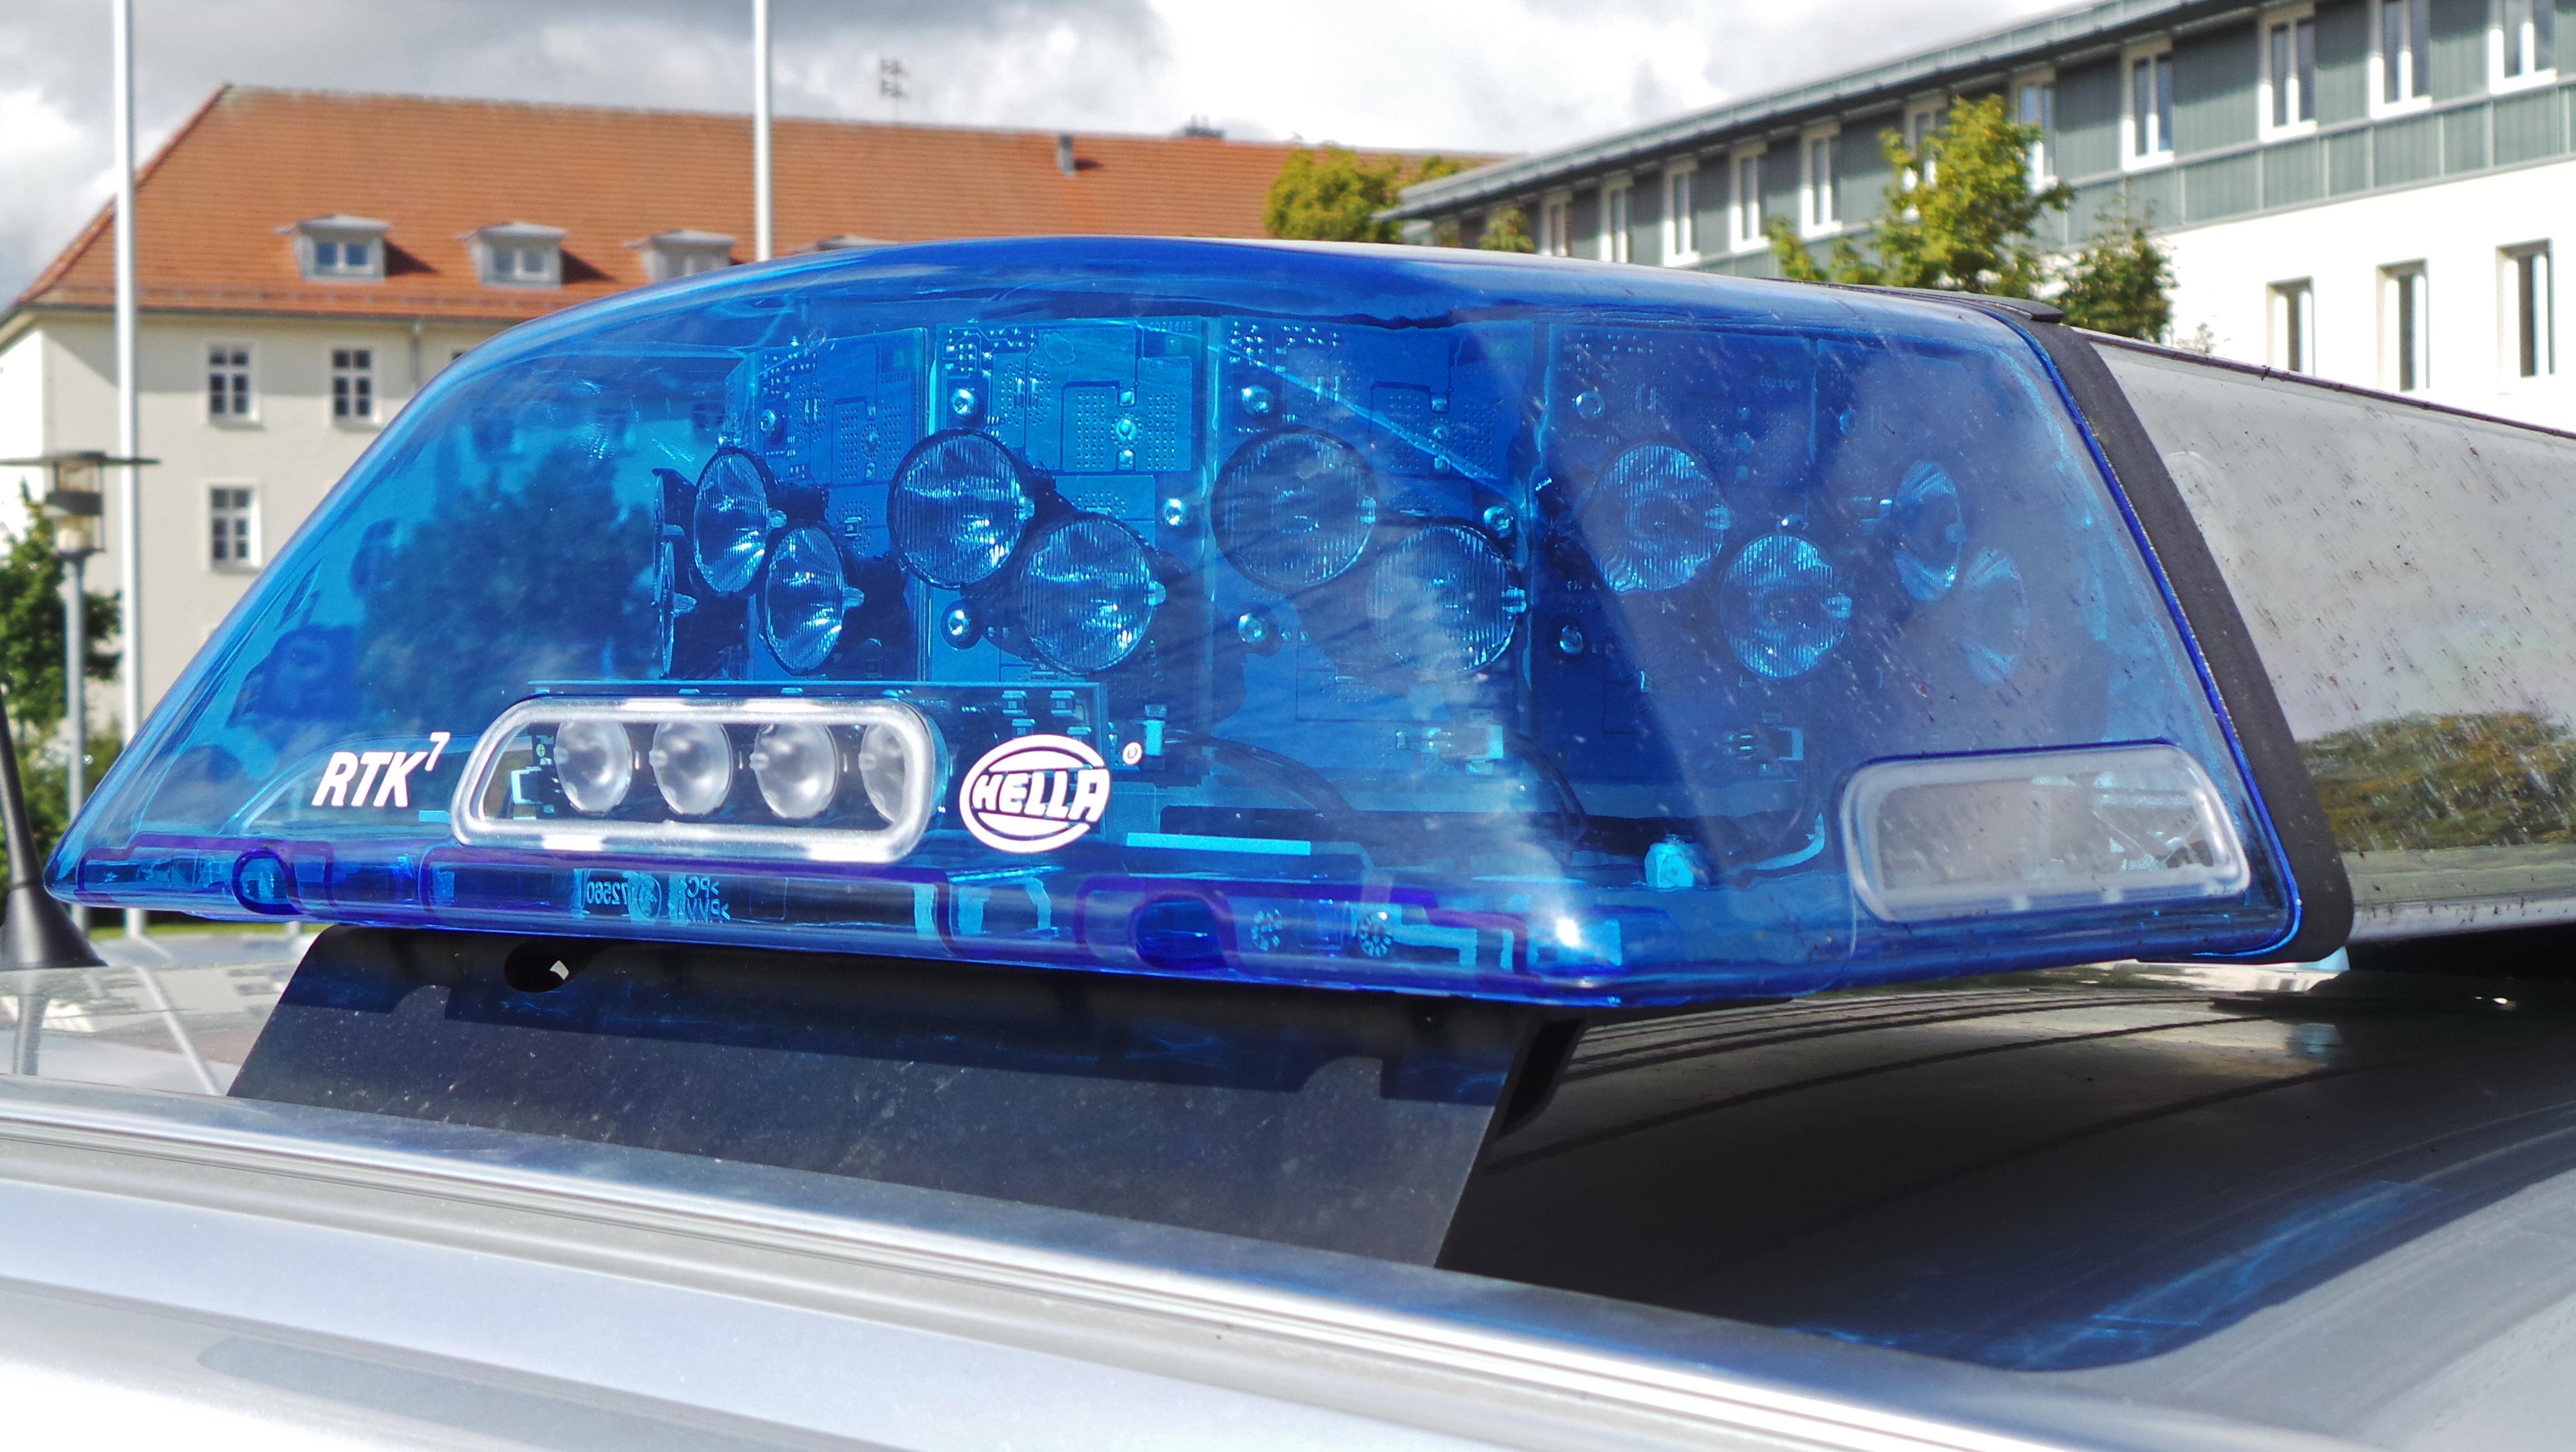 Polizei Symbolbild